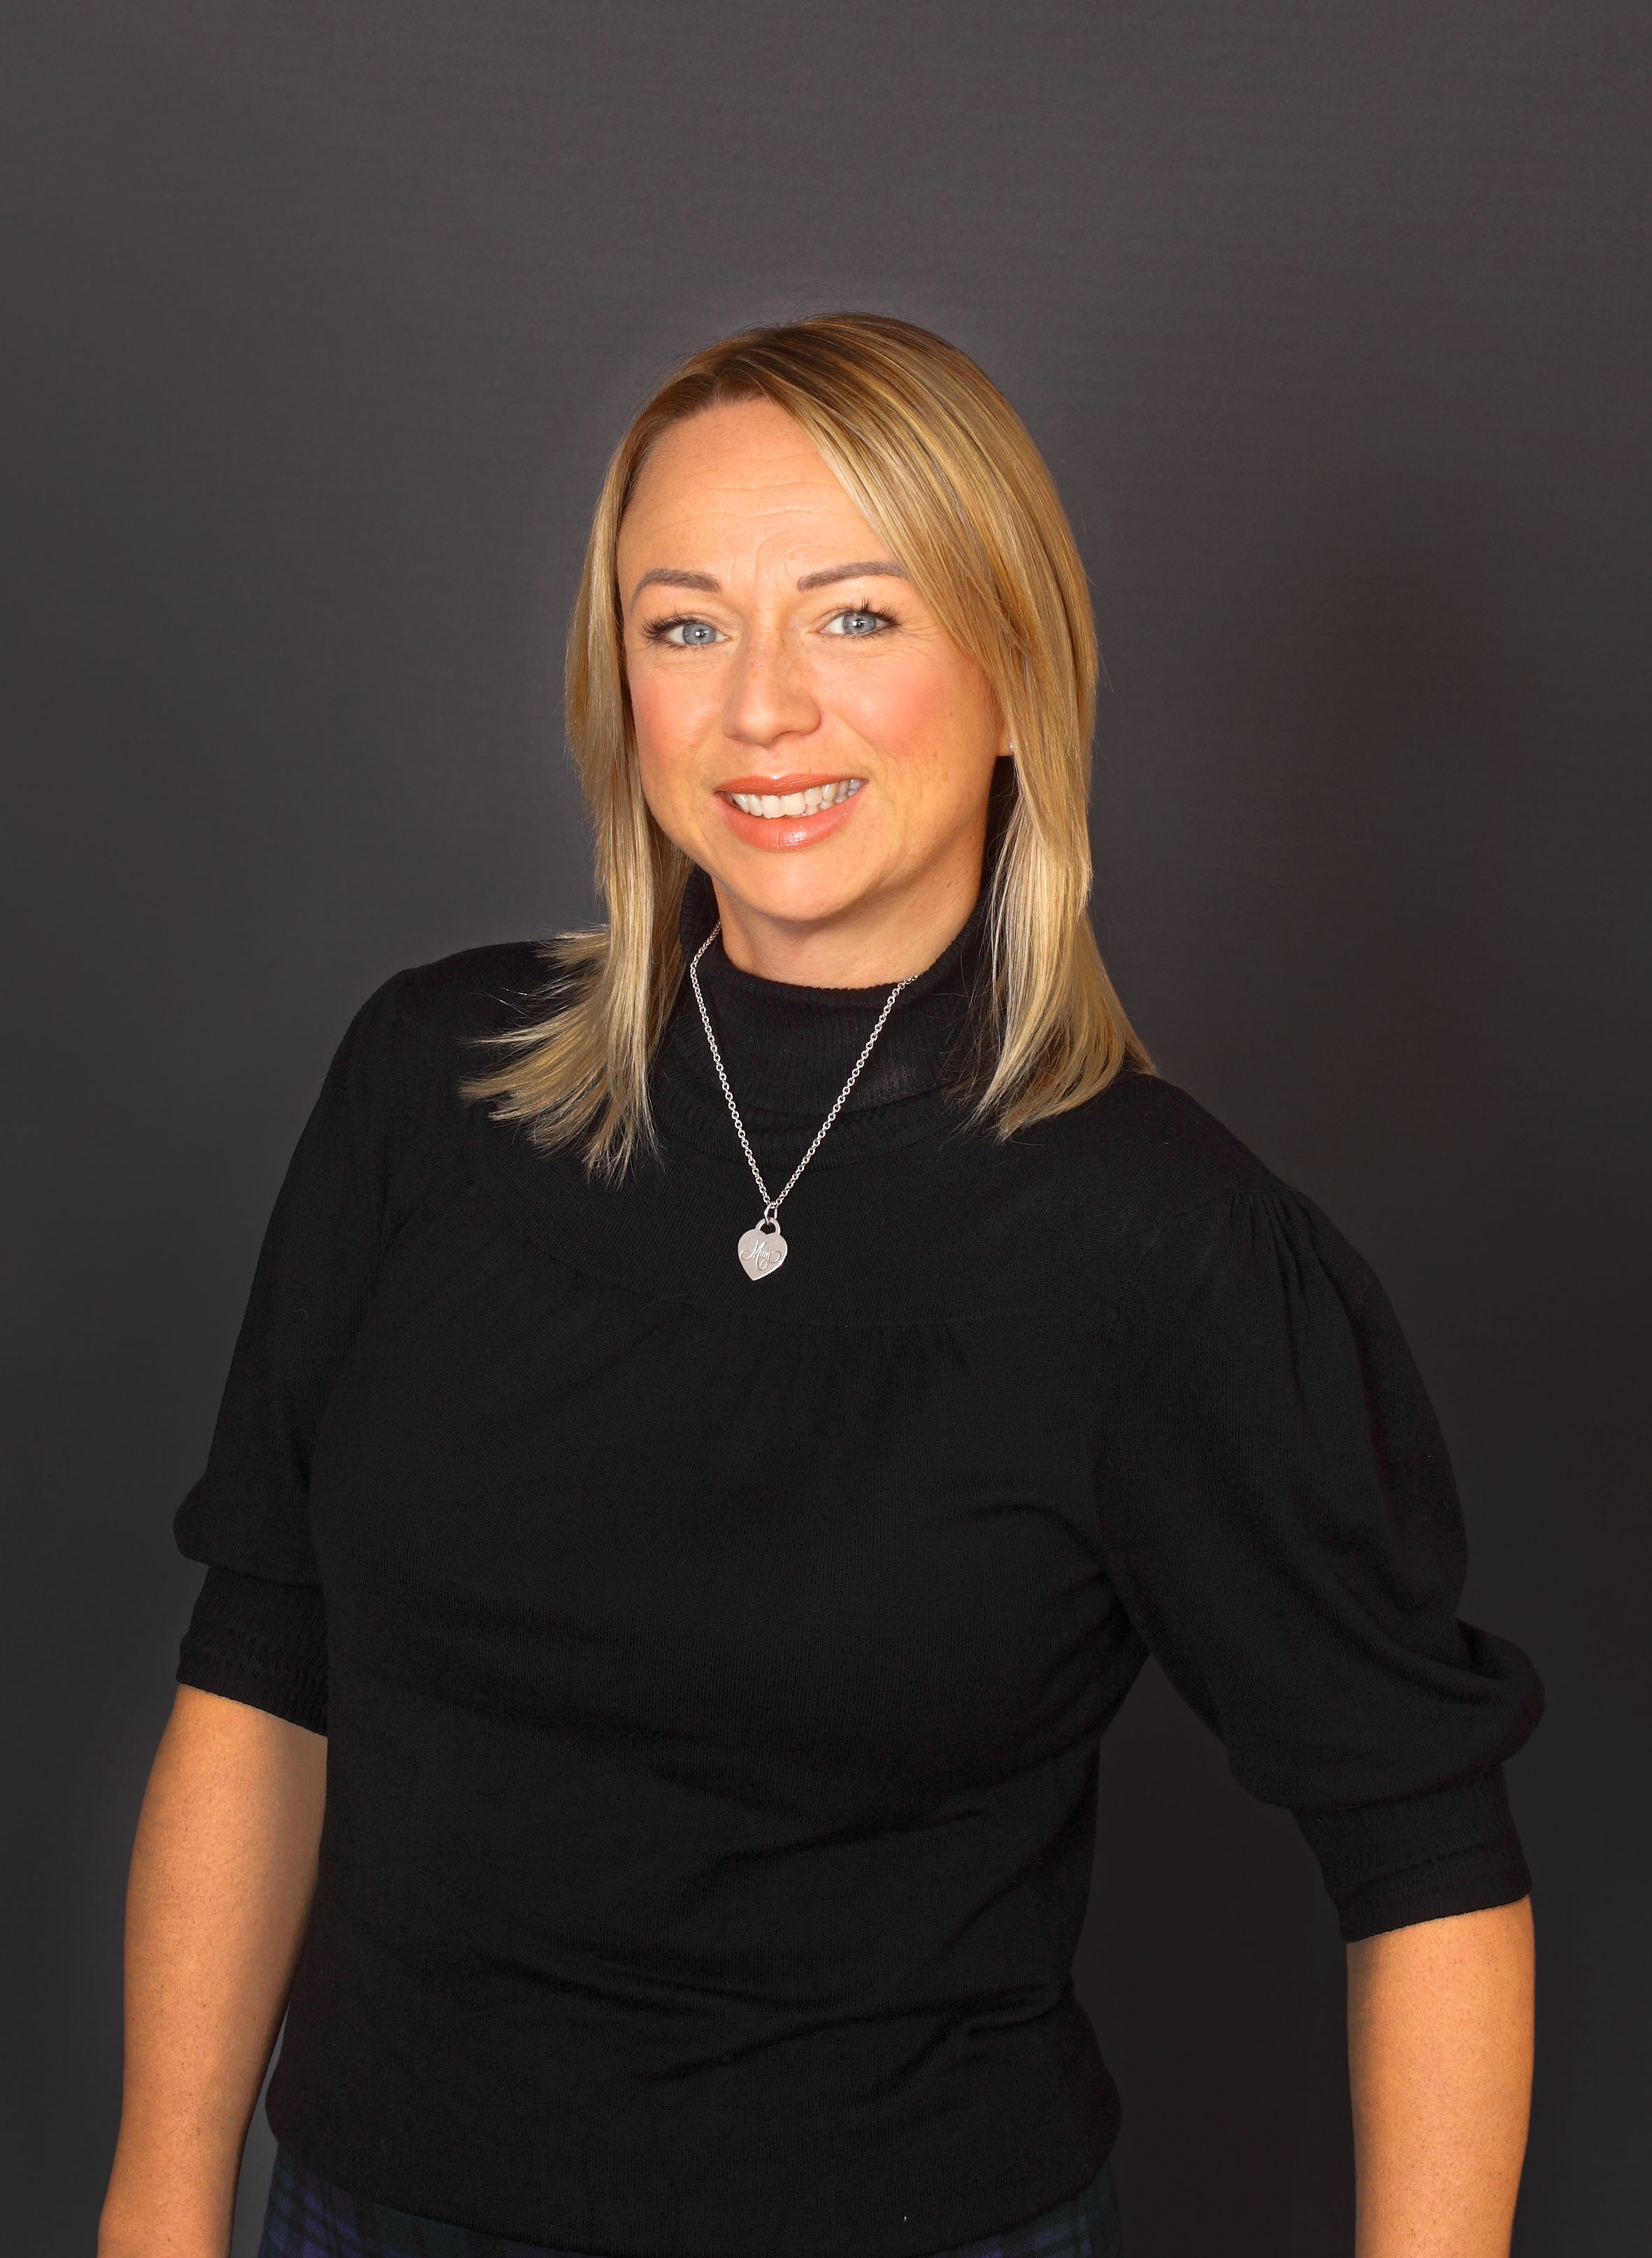 Helen Lambeth